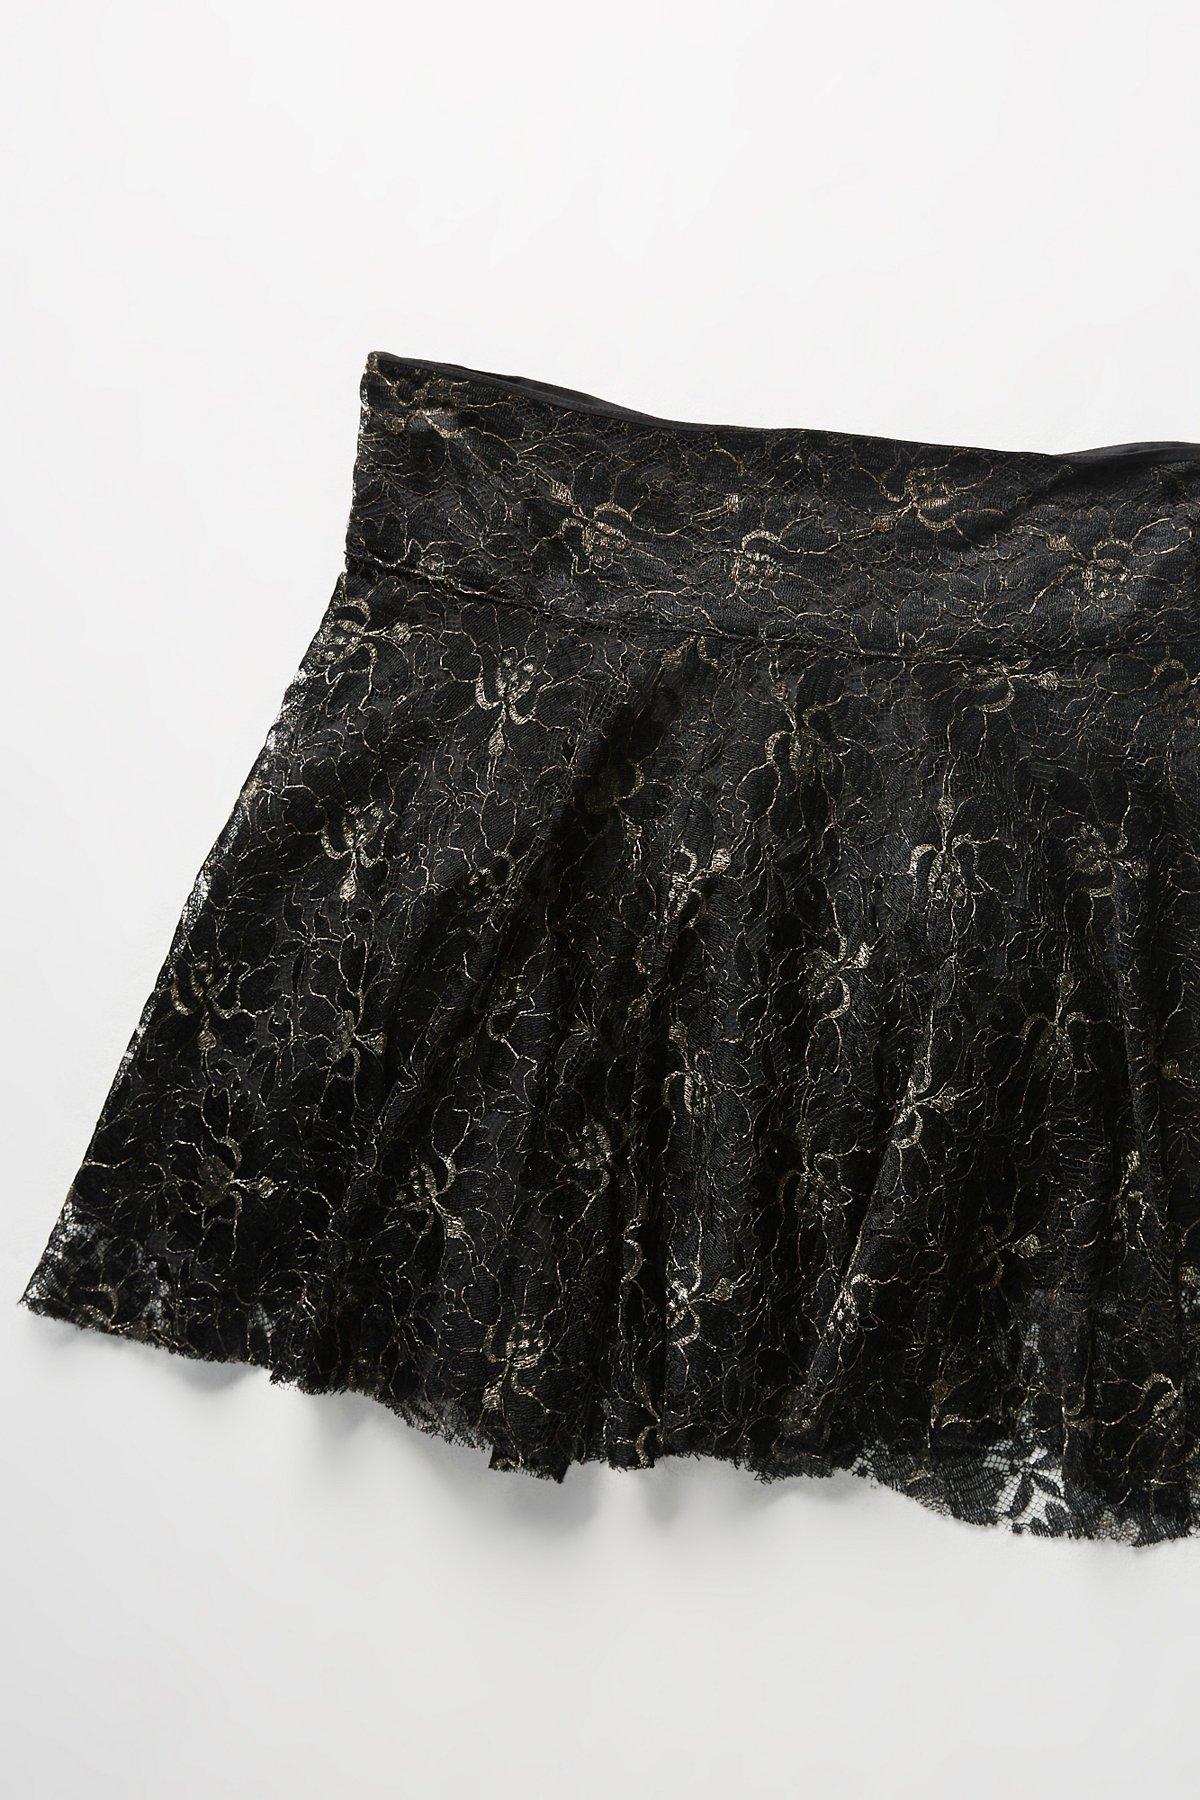 Vintage 1980s Lace Skirt